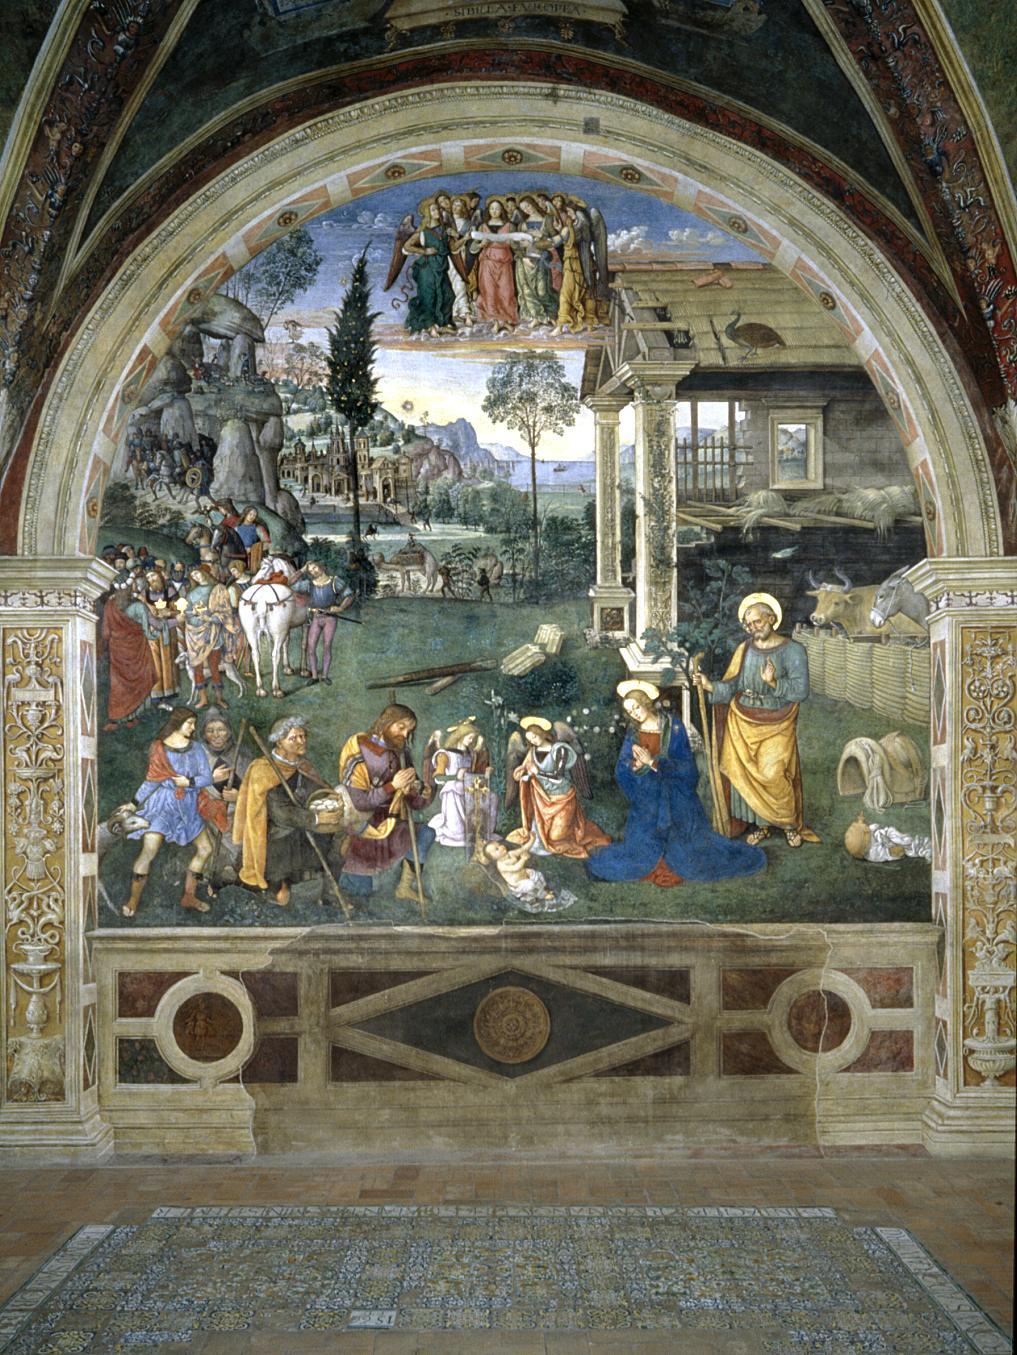 File:Pinturicchio Spello Nativit.jpg - Wikimedia Commons